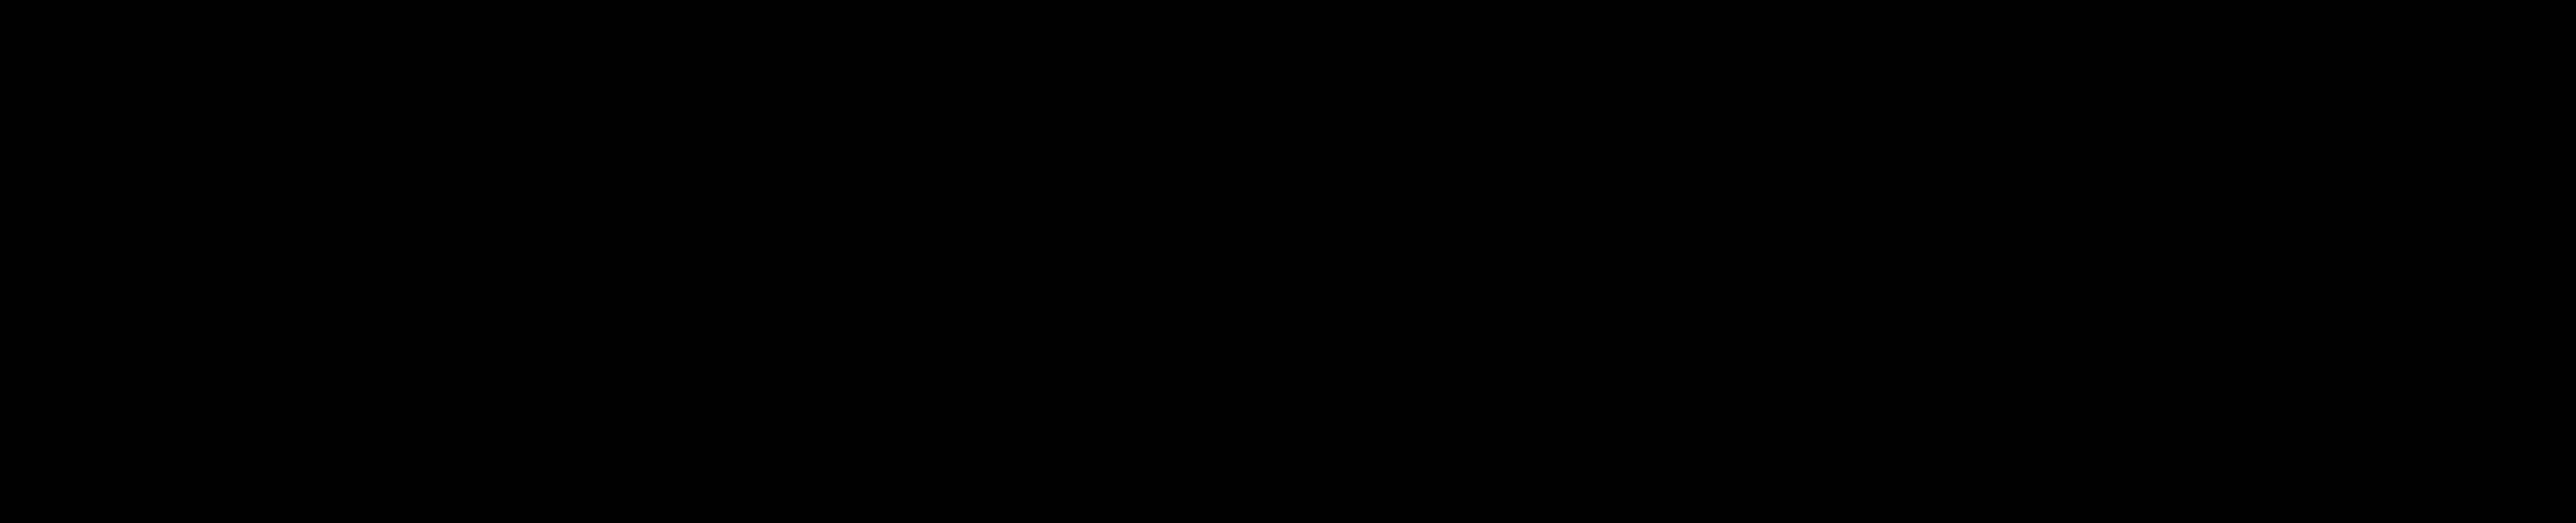 Prisma logo clipart png free Prisma Labs – Logos Download png free